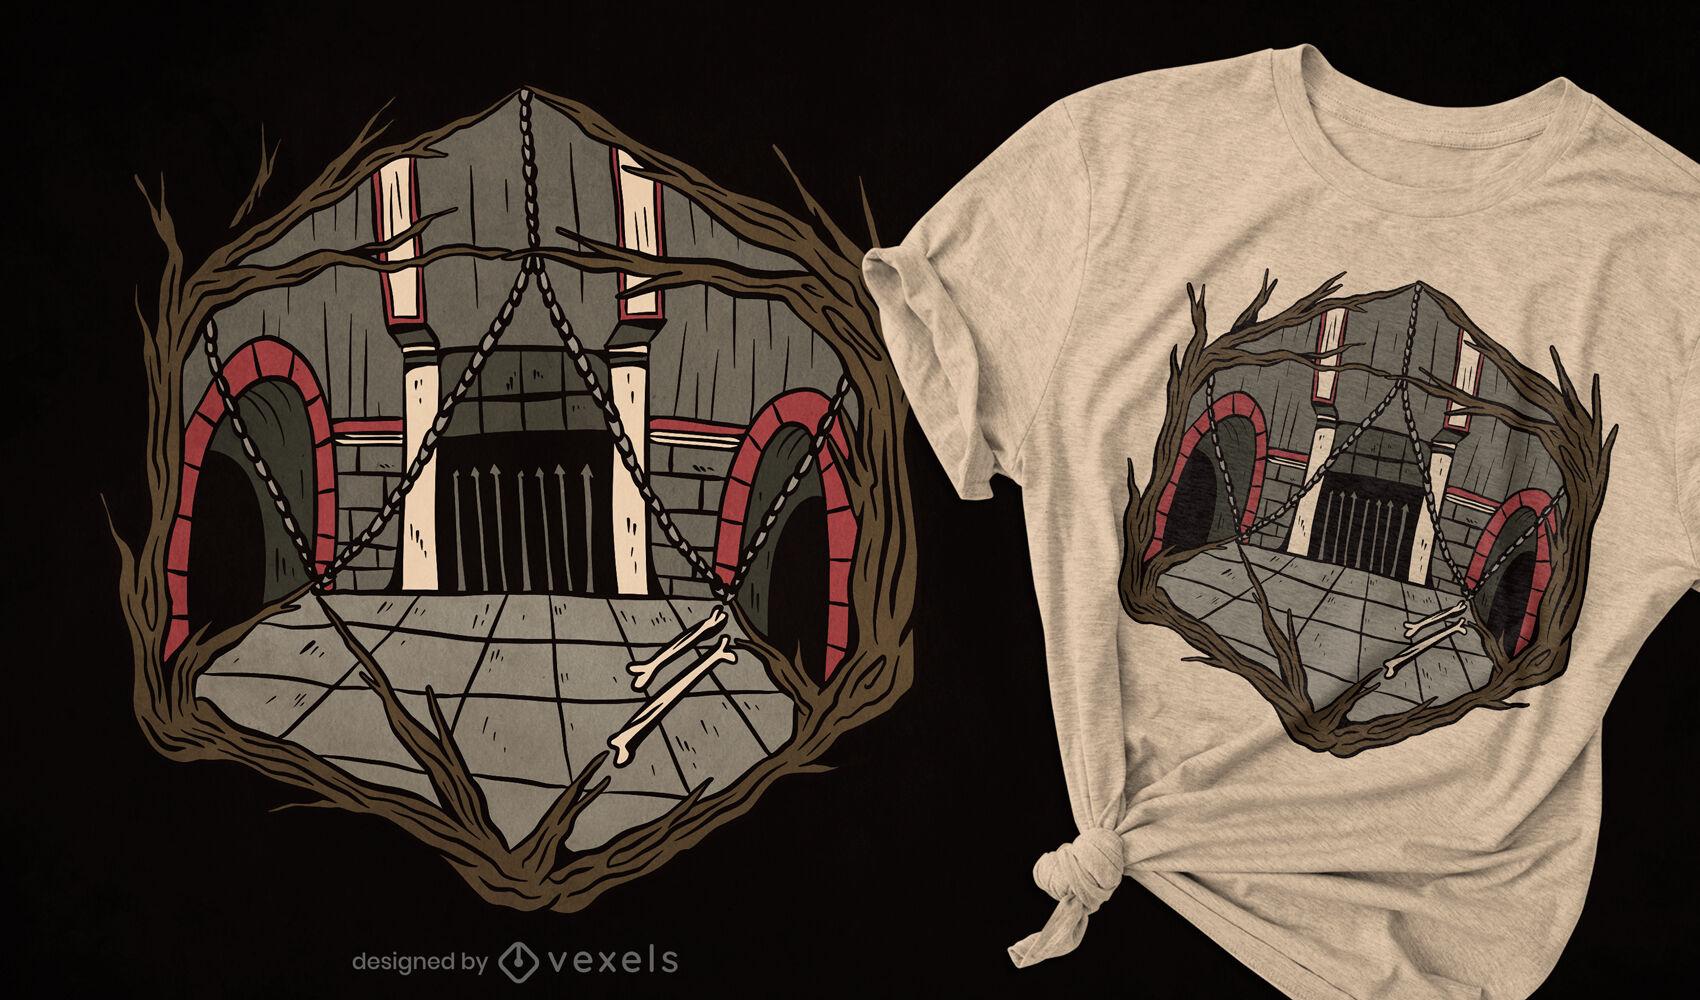 Dungeon dice t-shirt design